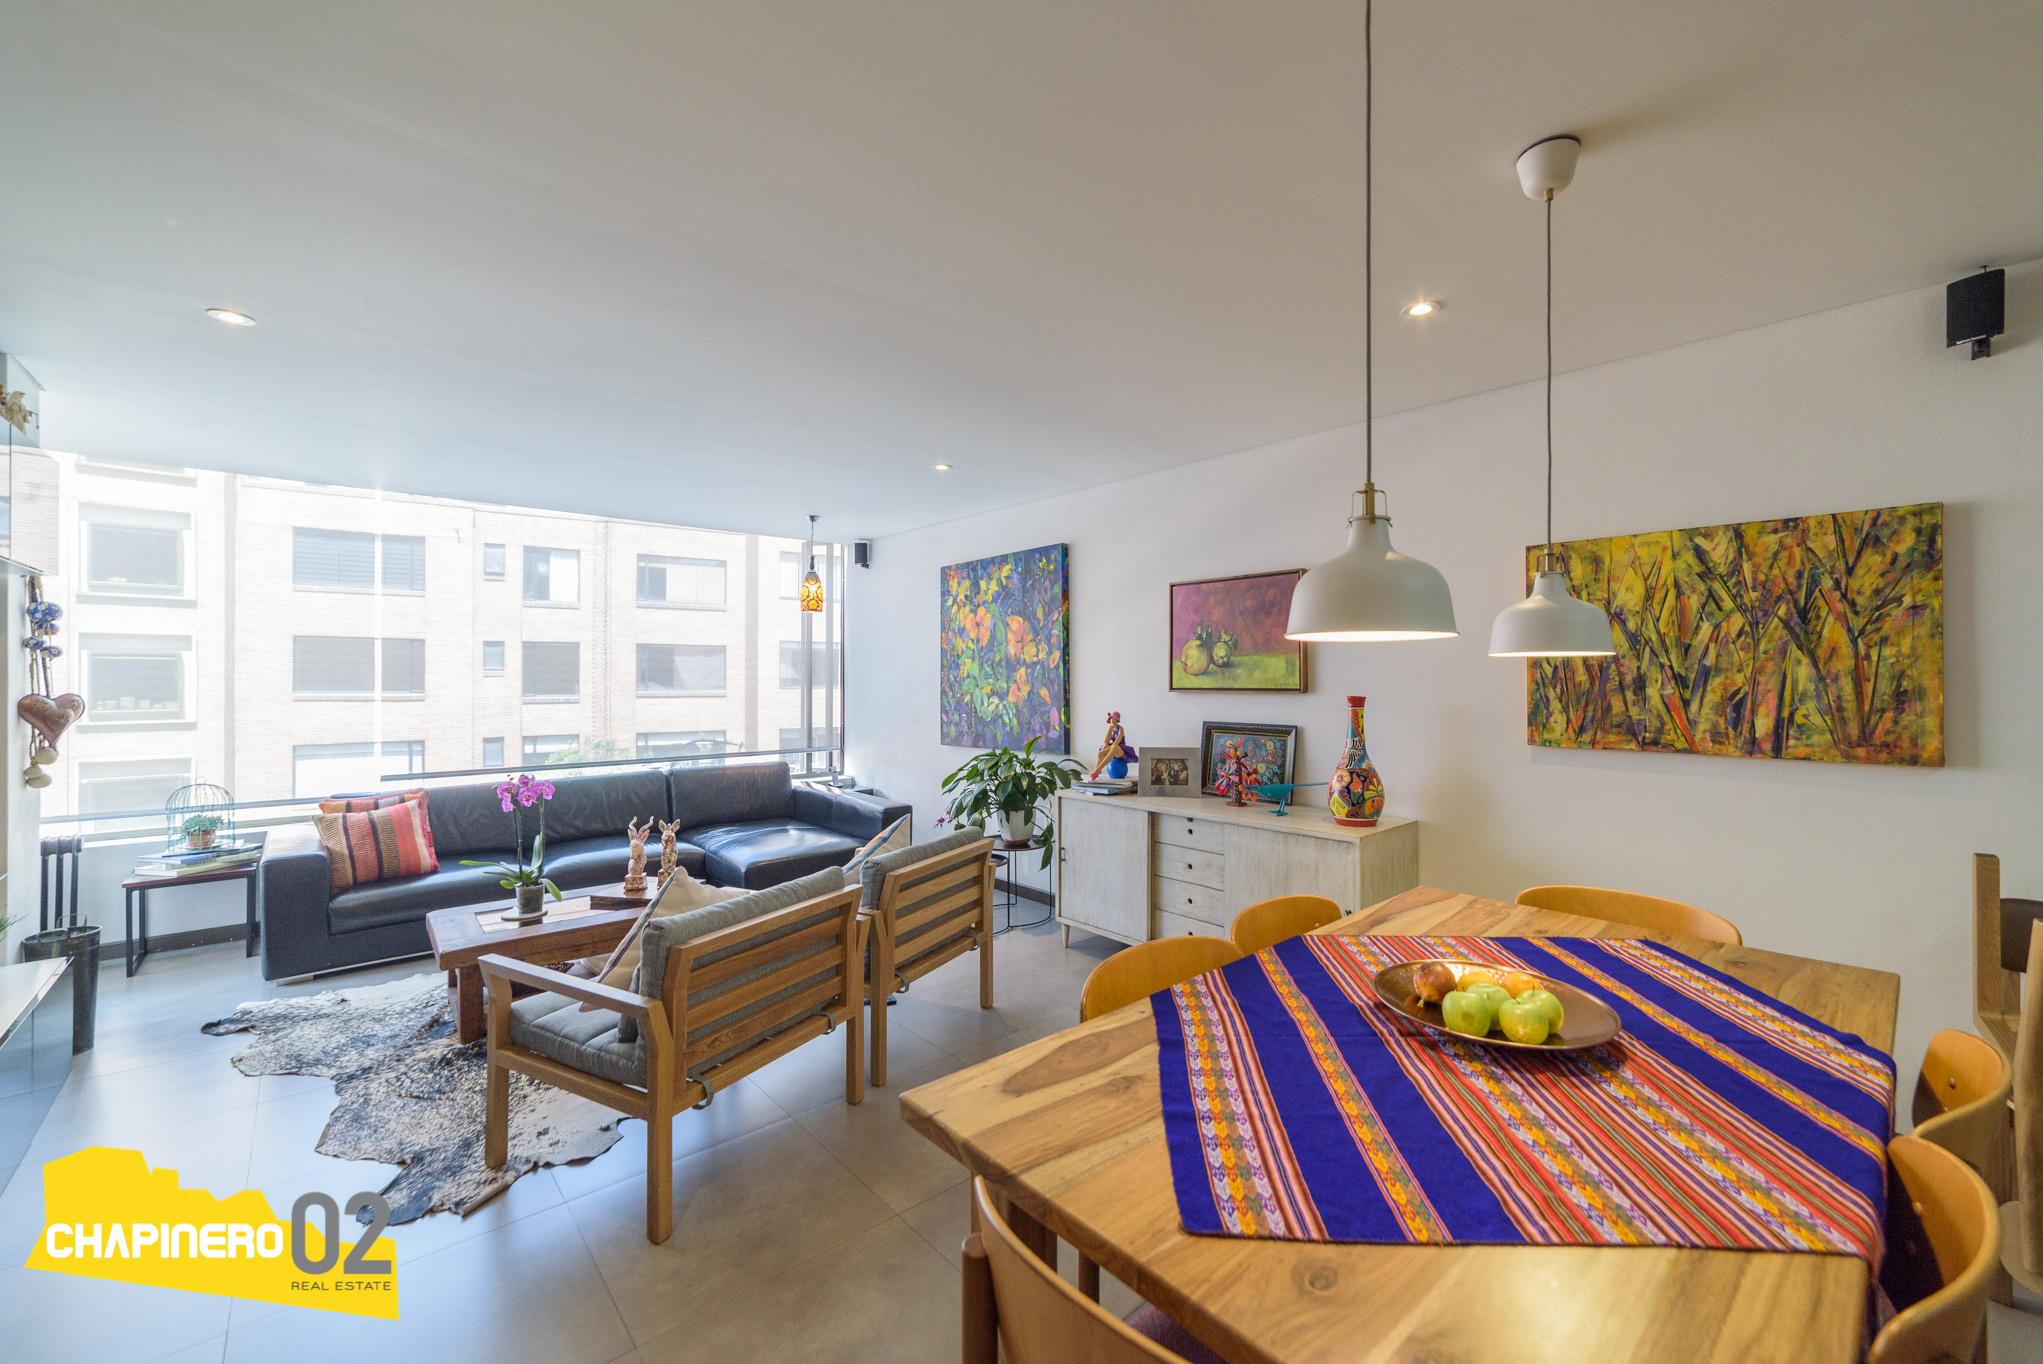 Apto Venta :: 87 m² :: Bellavista :: $610 M